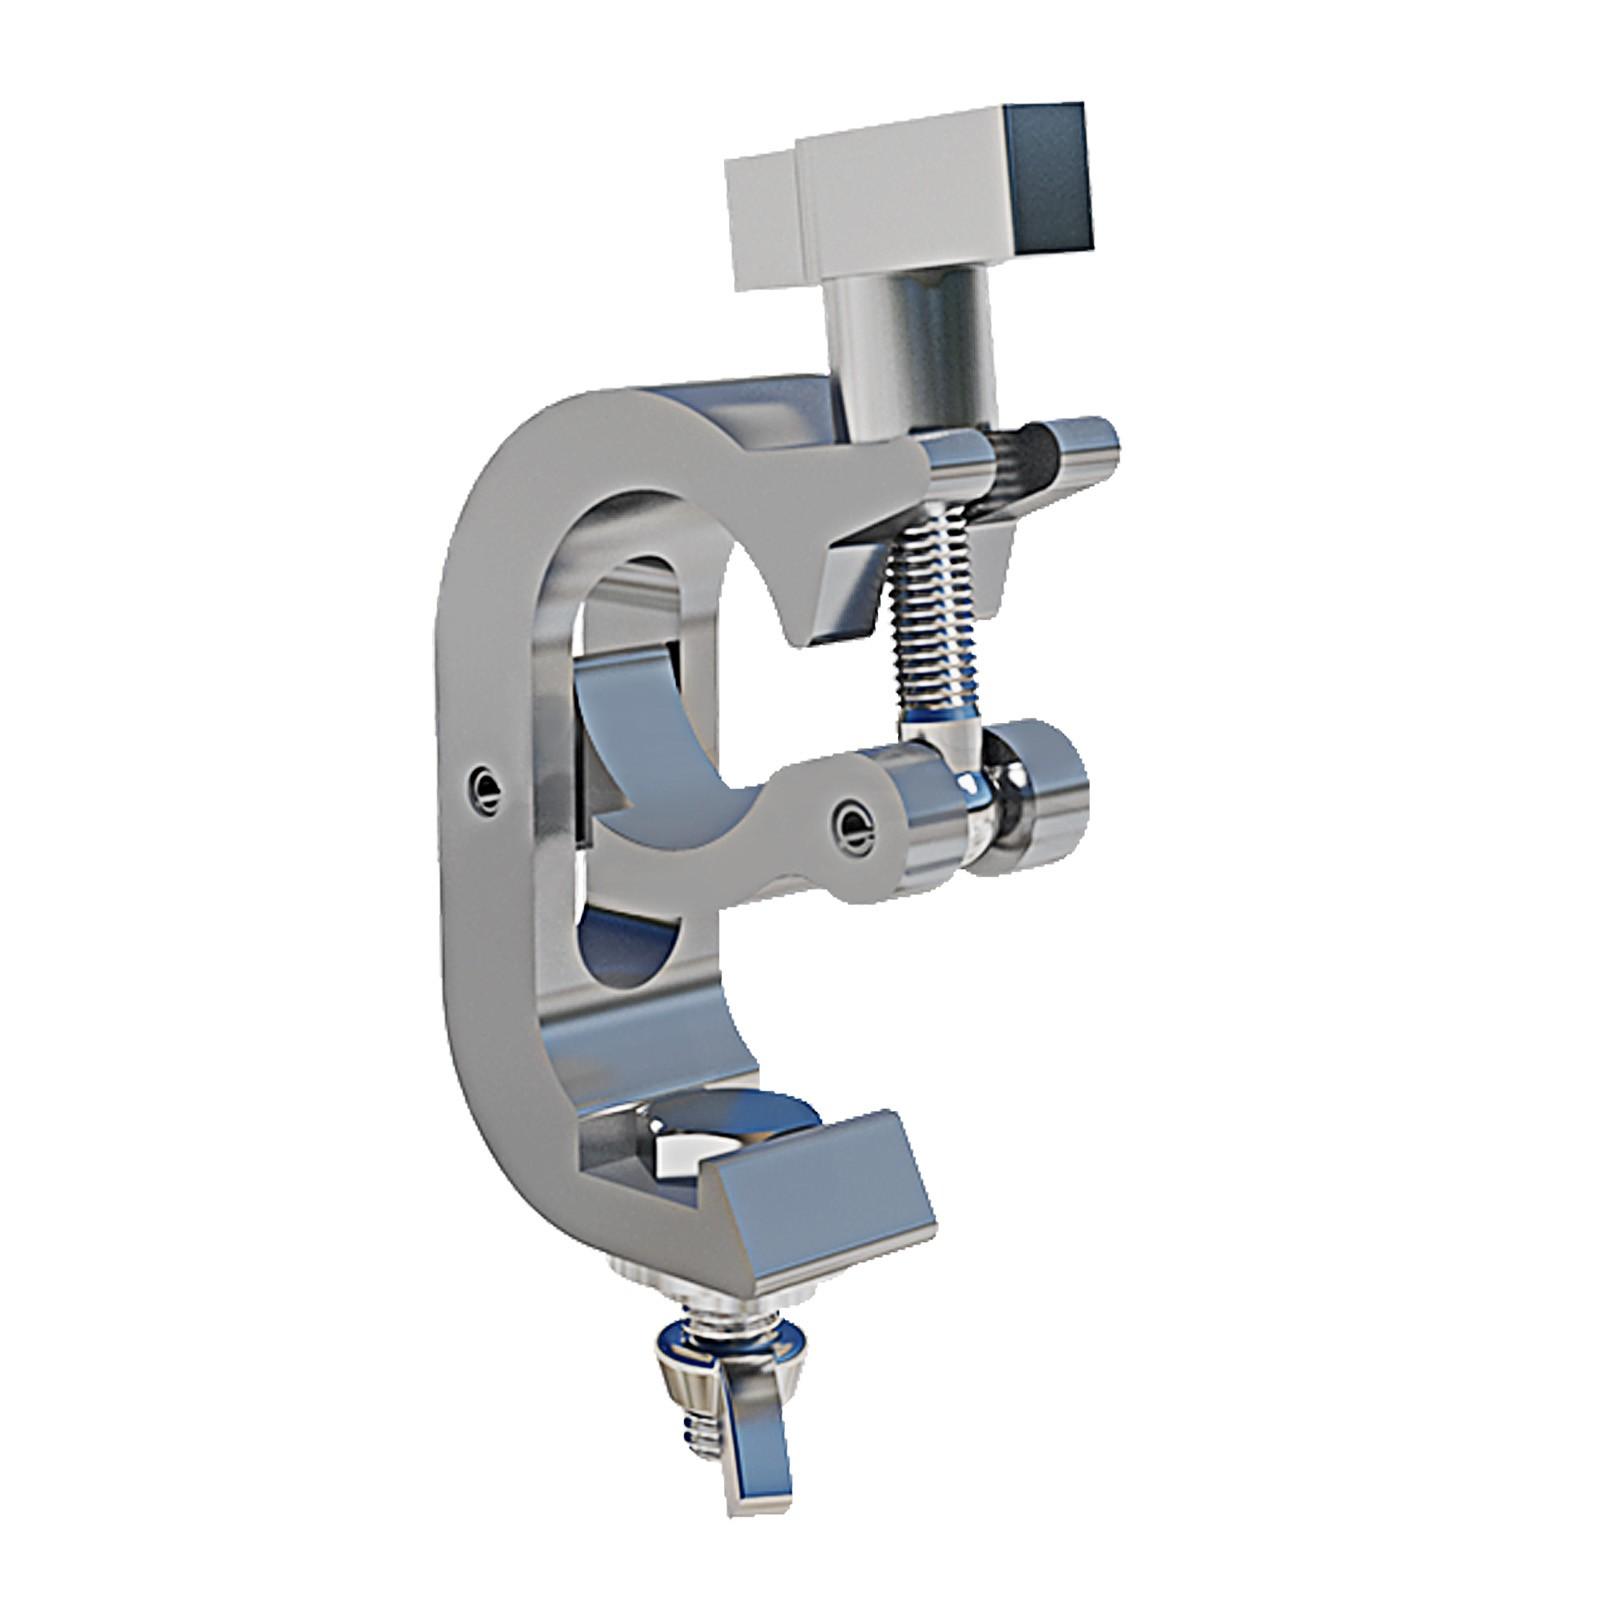 global-truss-jr-trigger-clamp.jpg